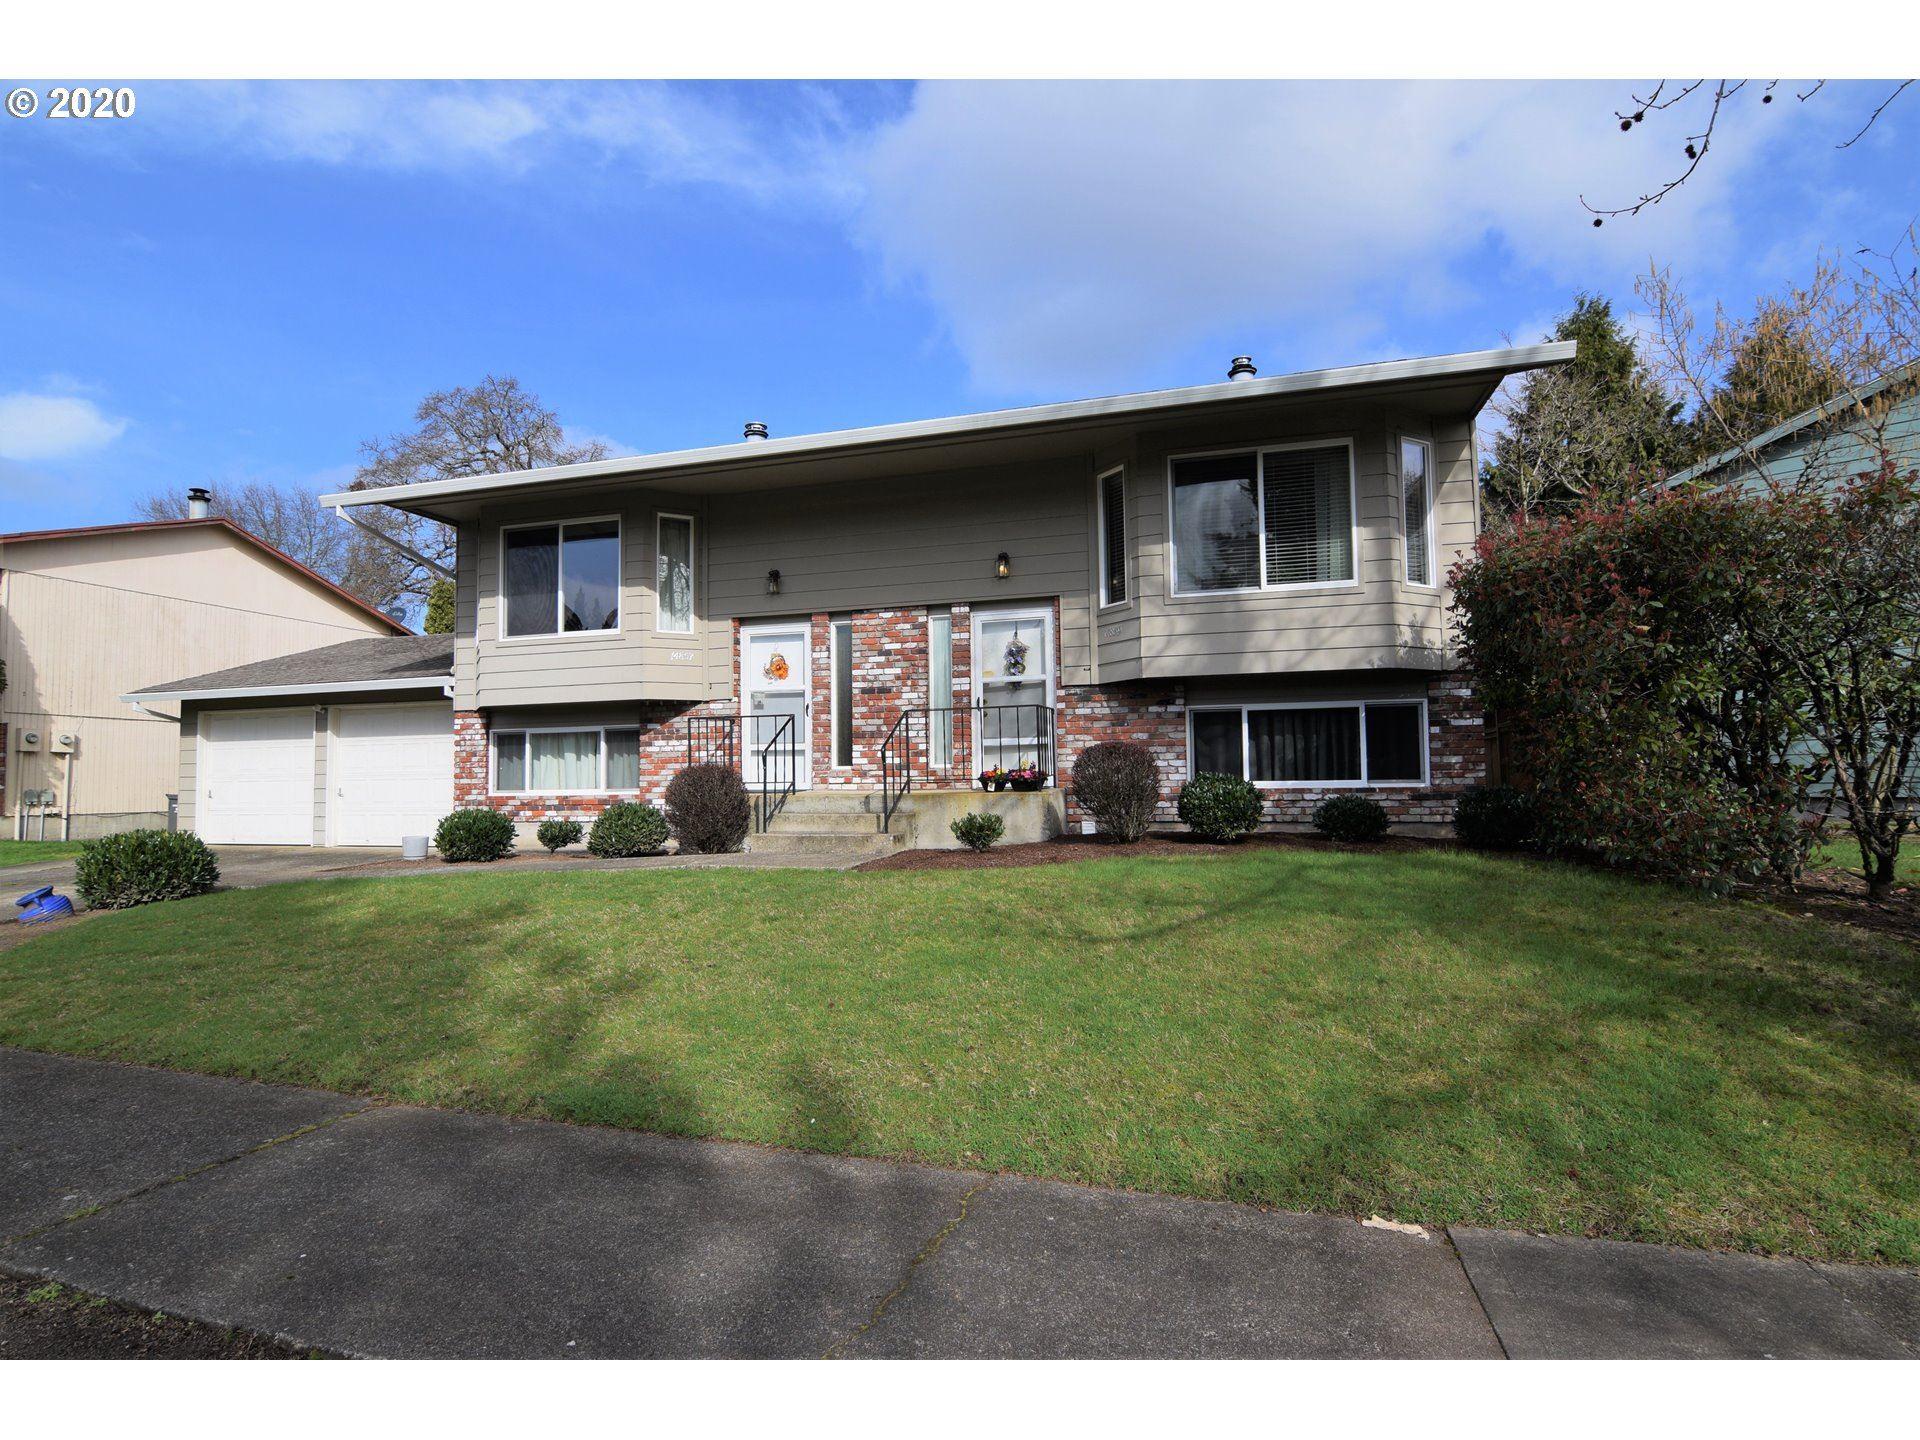 14857 SE TAYLOR CT, Portland, OR 97233 - MLS#: 20204299